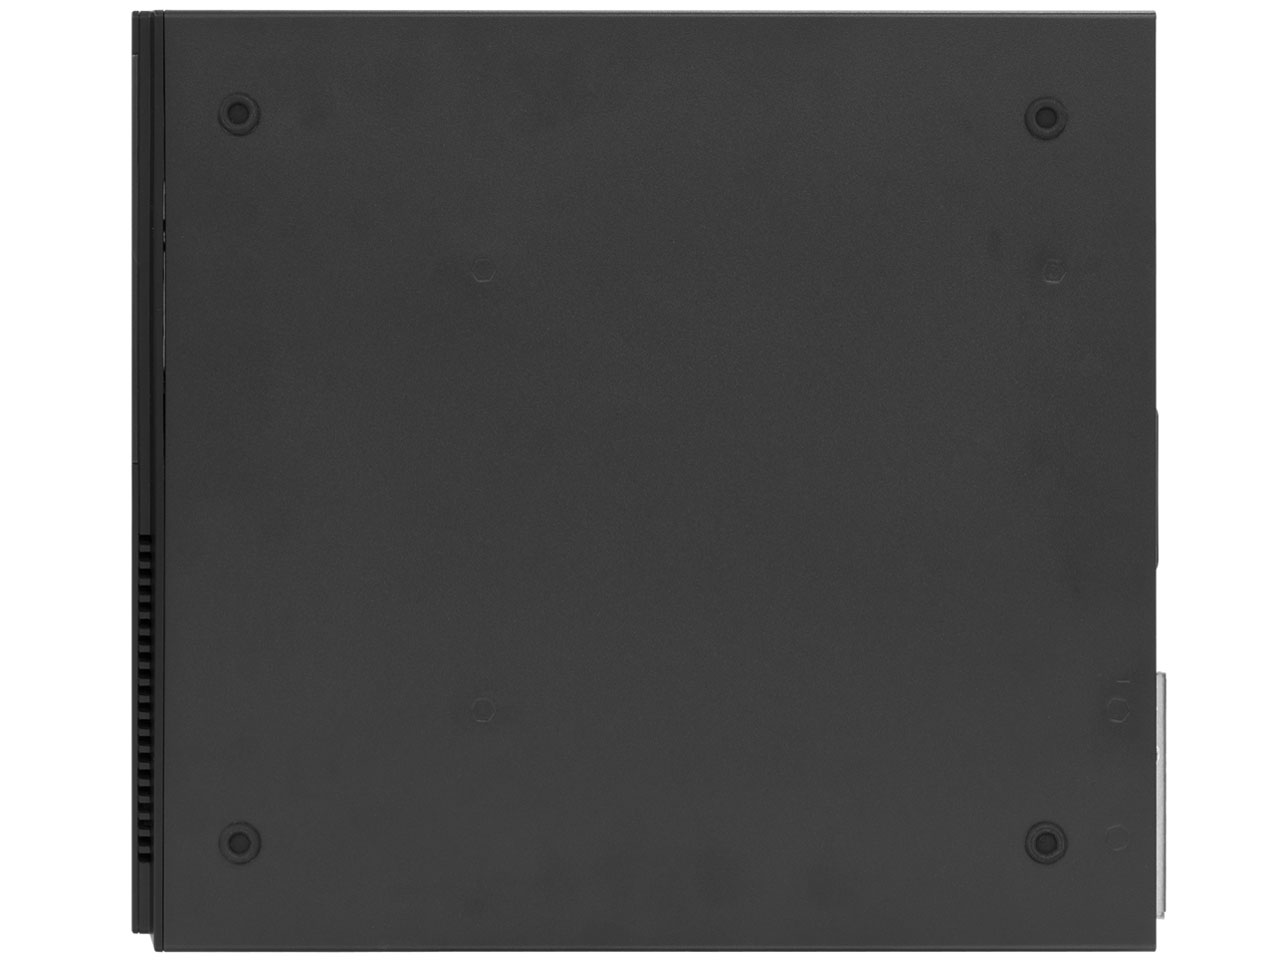 『本体 右側面』 VSK2000-U3 の製品画像